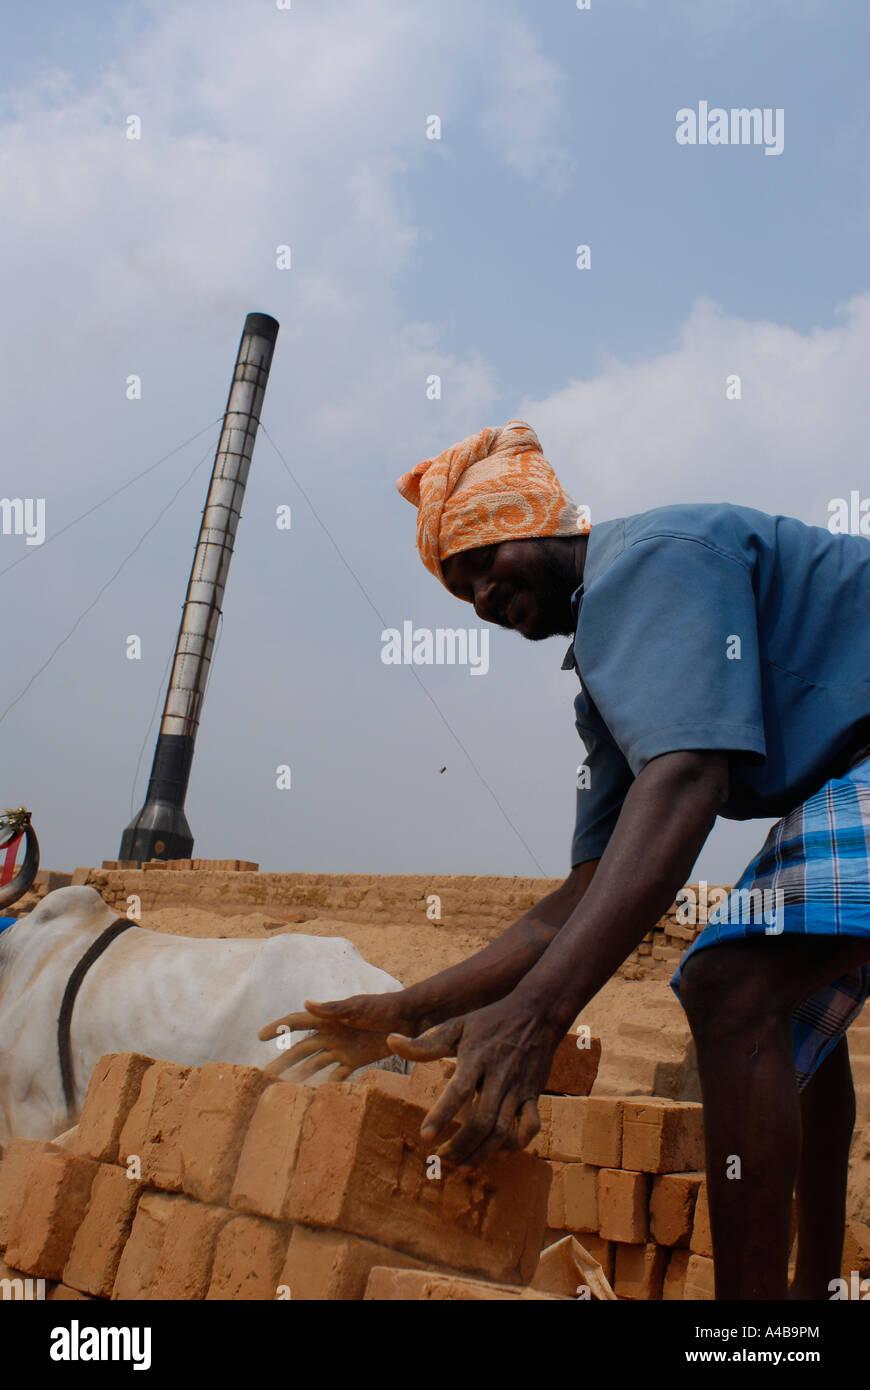 Stock image of Dalit tribal village people working in a brickyard or brick factory near Chennai Tamil Nadu India - Stock Image